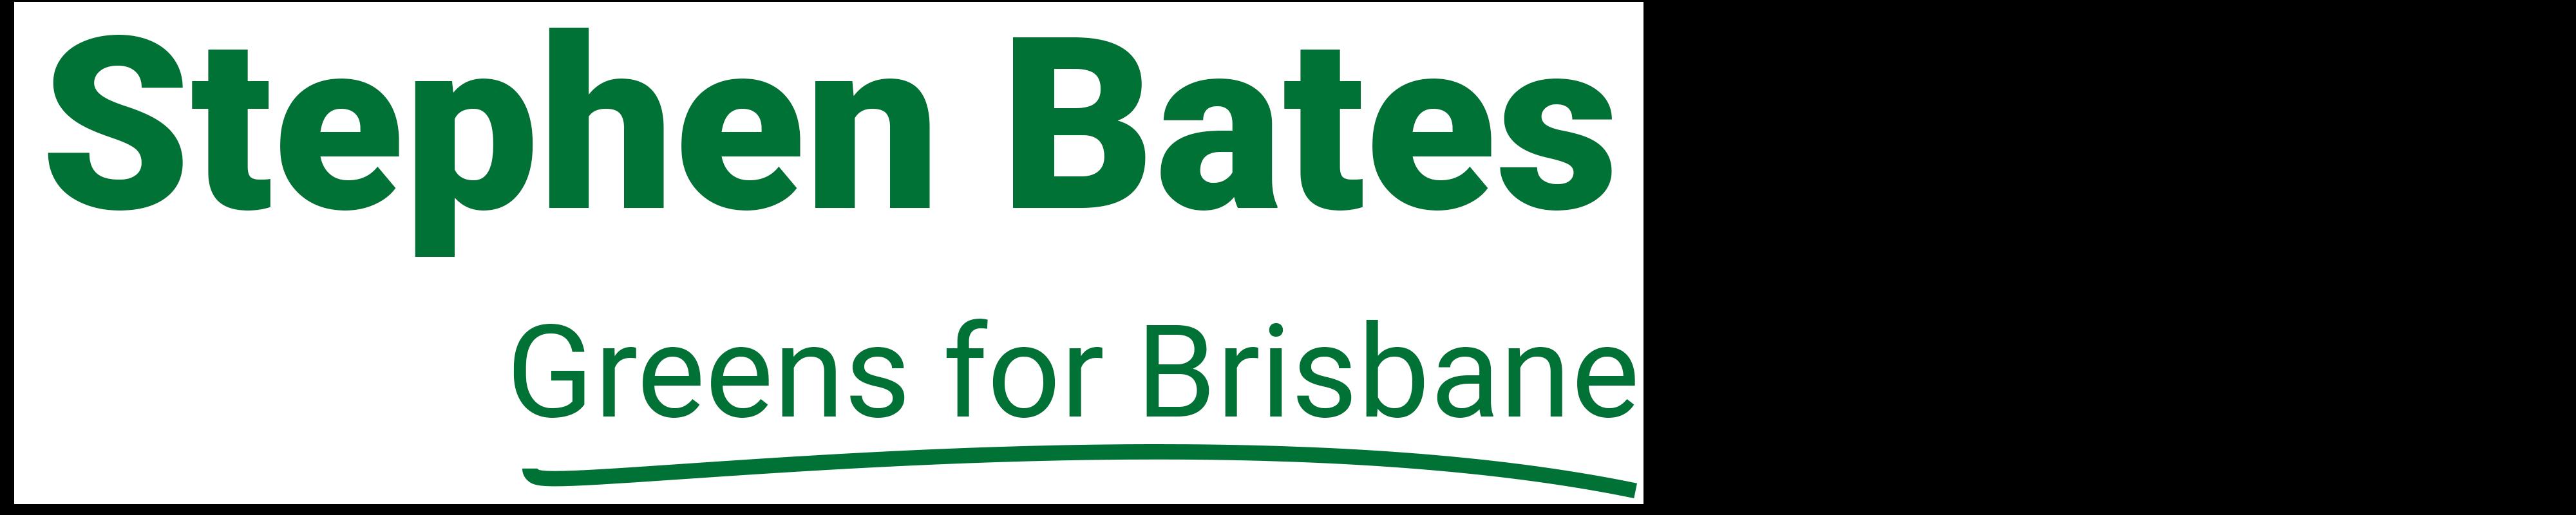 Stephen Bates for Brisbane